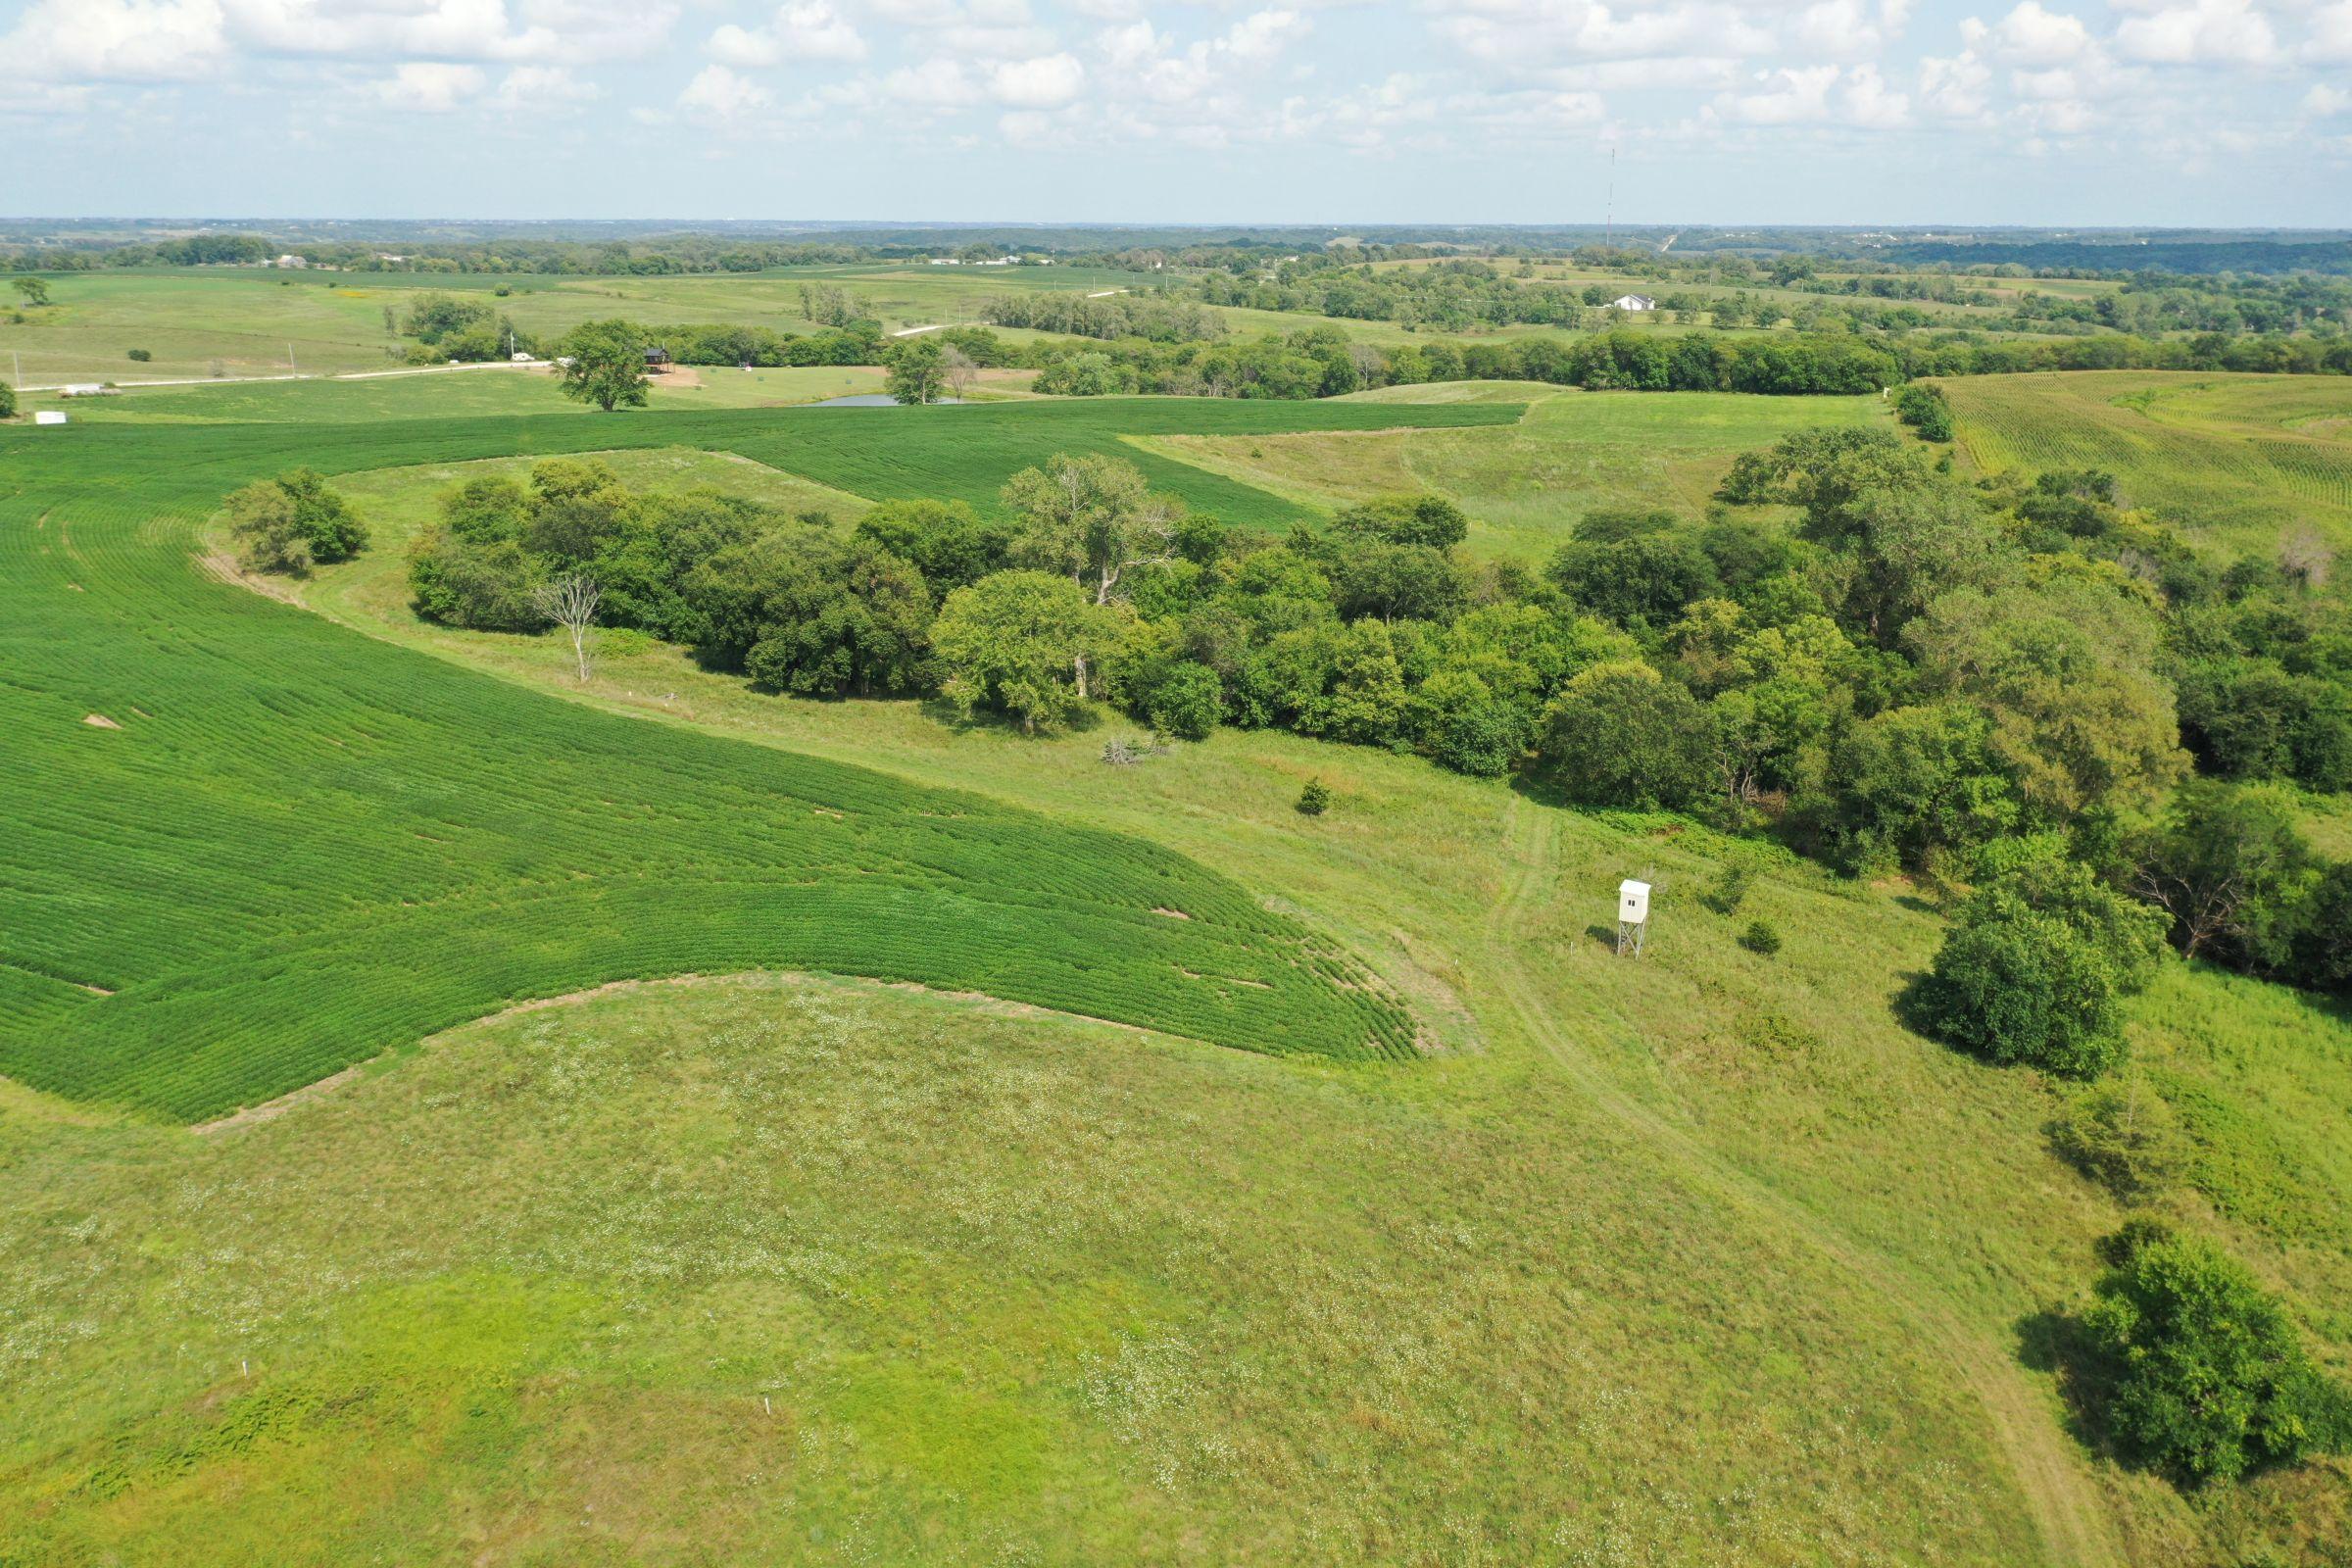 land-warren-county-iowa-12-acres-listing-number-15694-2-2021-08-20-203419.JPG